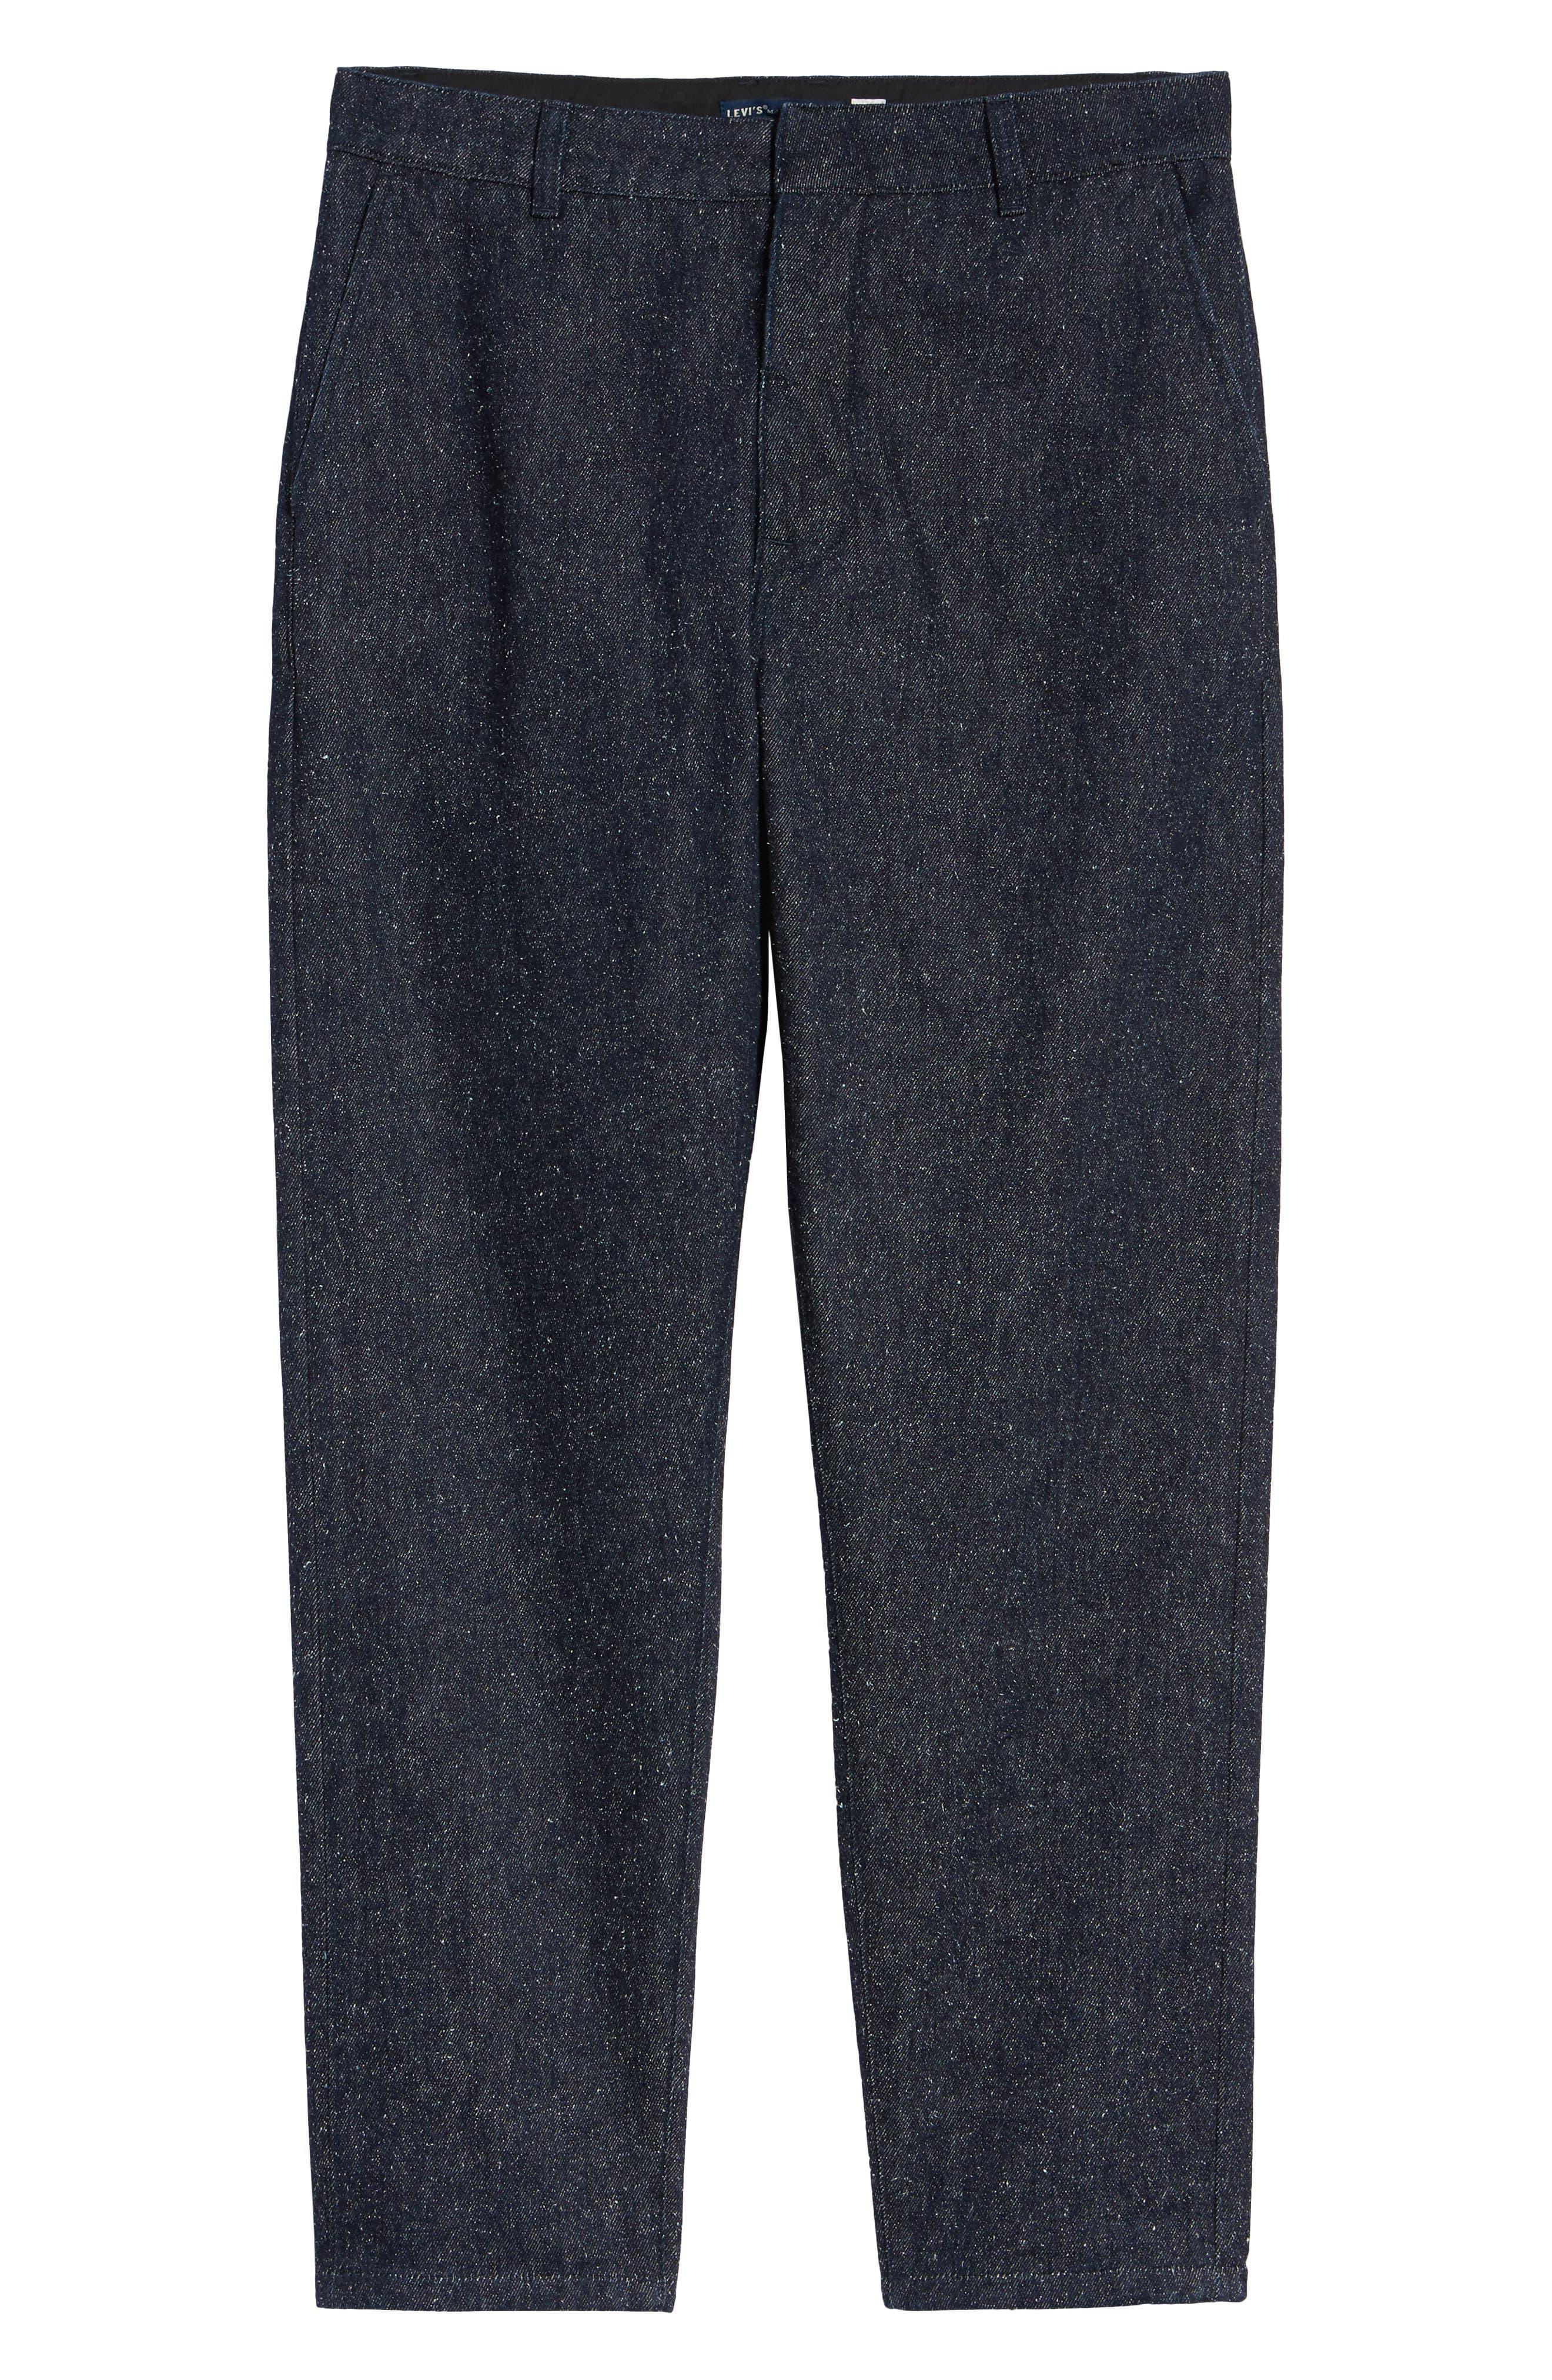 Tapered Straight Leg Cotton & Silk Trousers,                             Alternate thumbnail 6, color,                             NEPPY DENIM